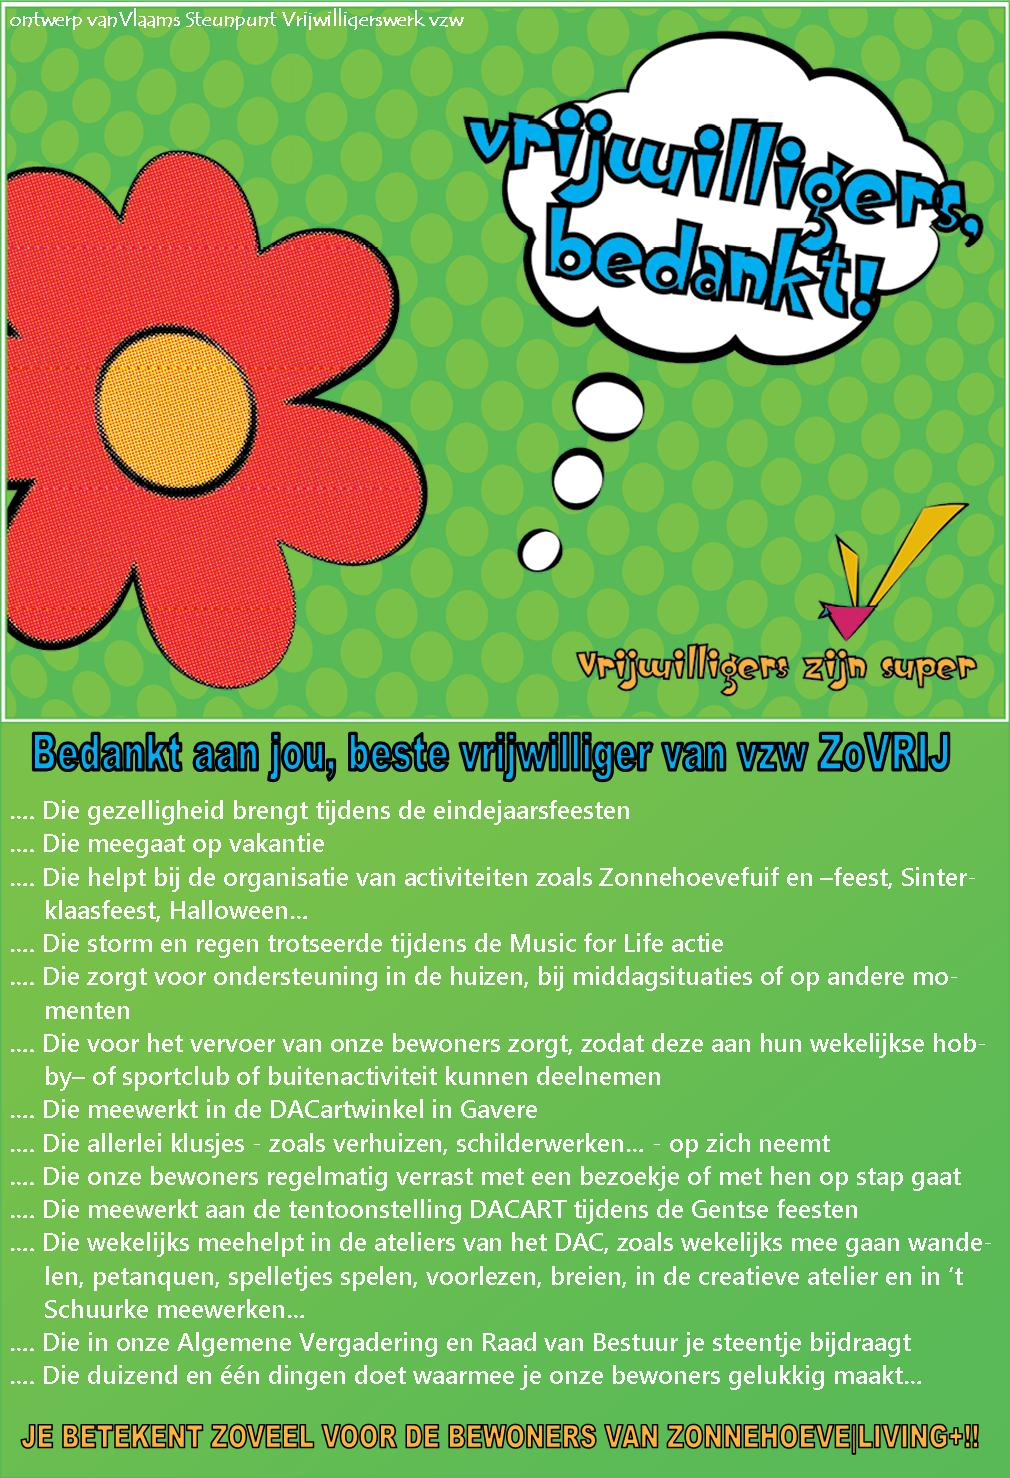 2014-03-01 Bedankingskaartje Week vd vrijwilliger